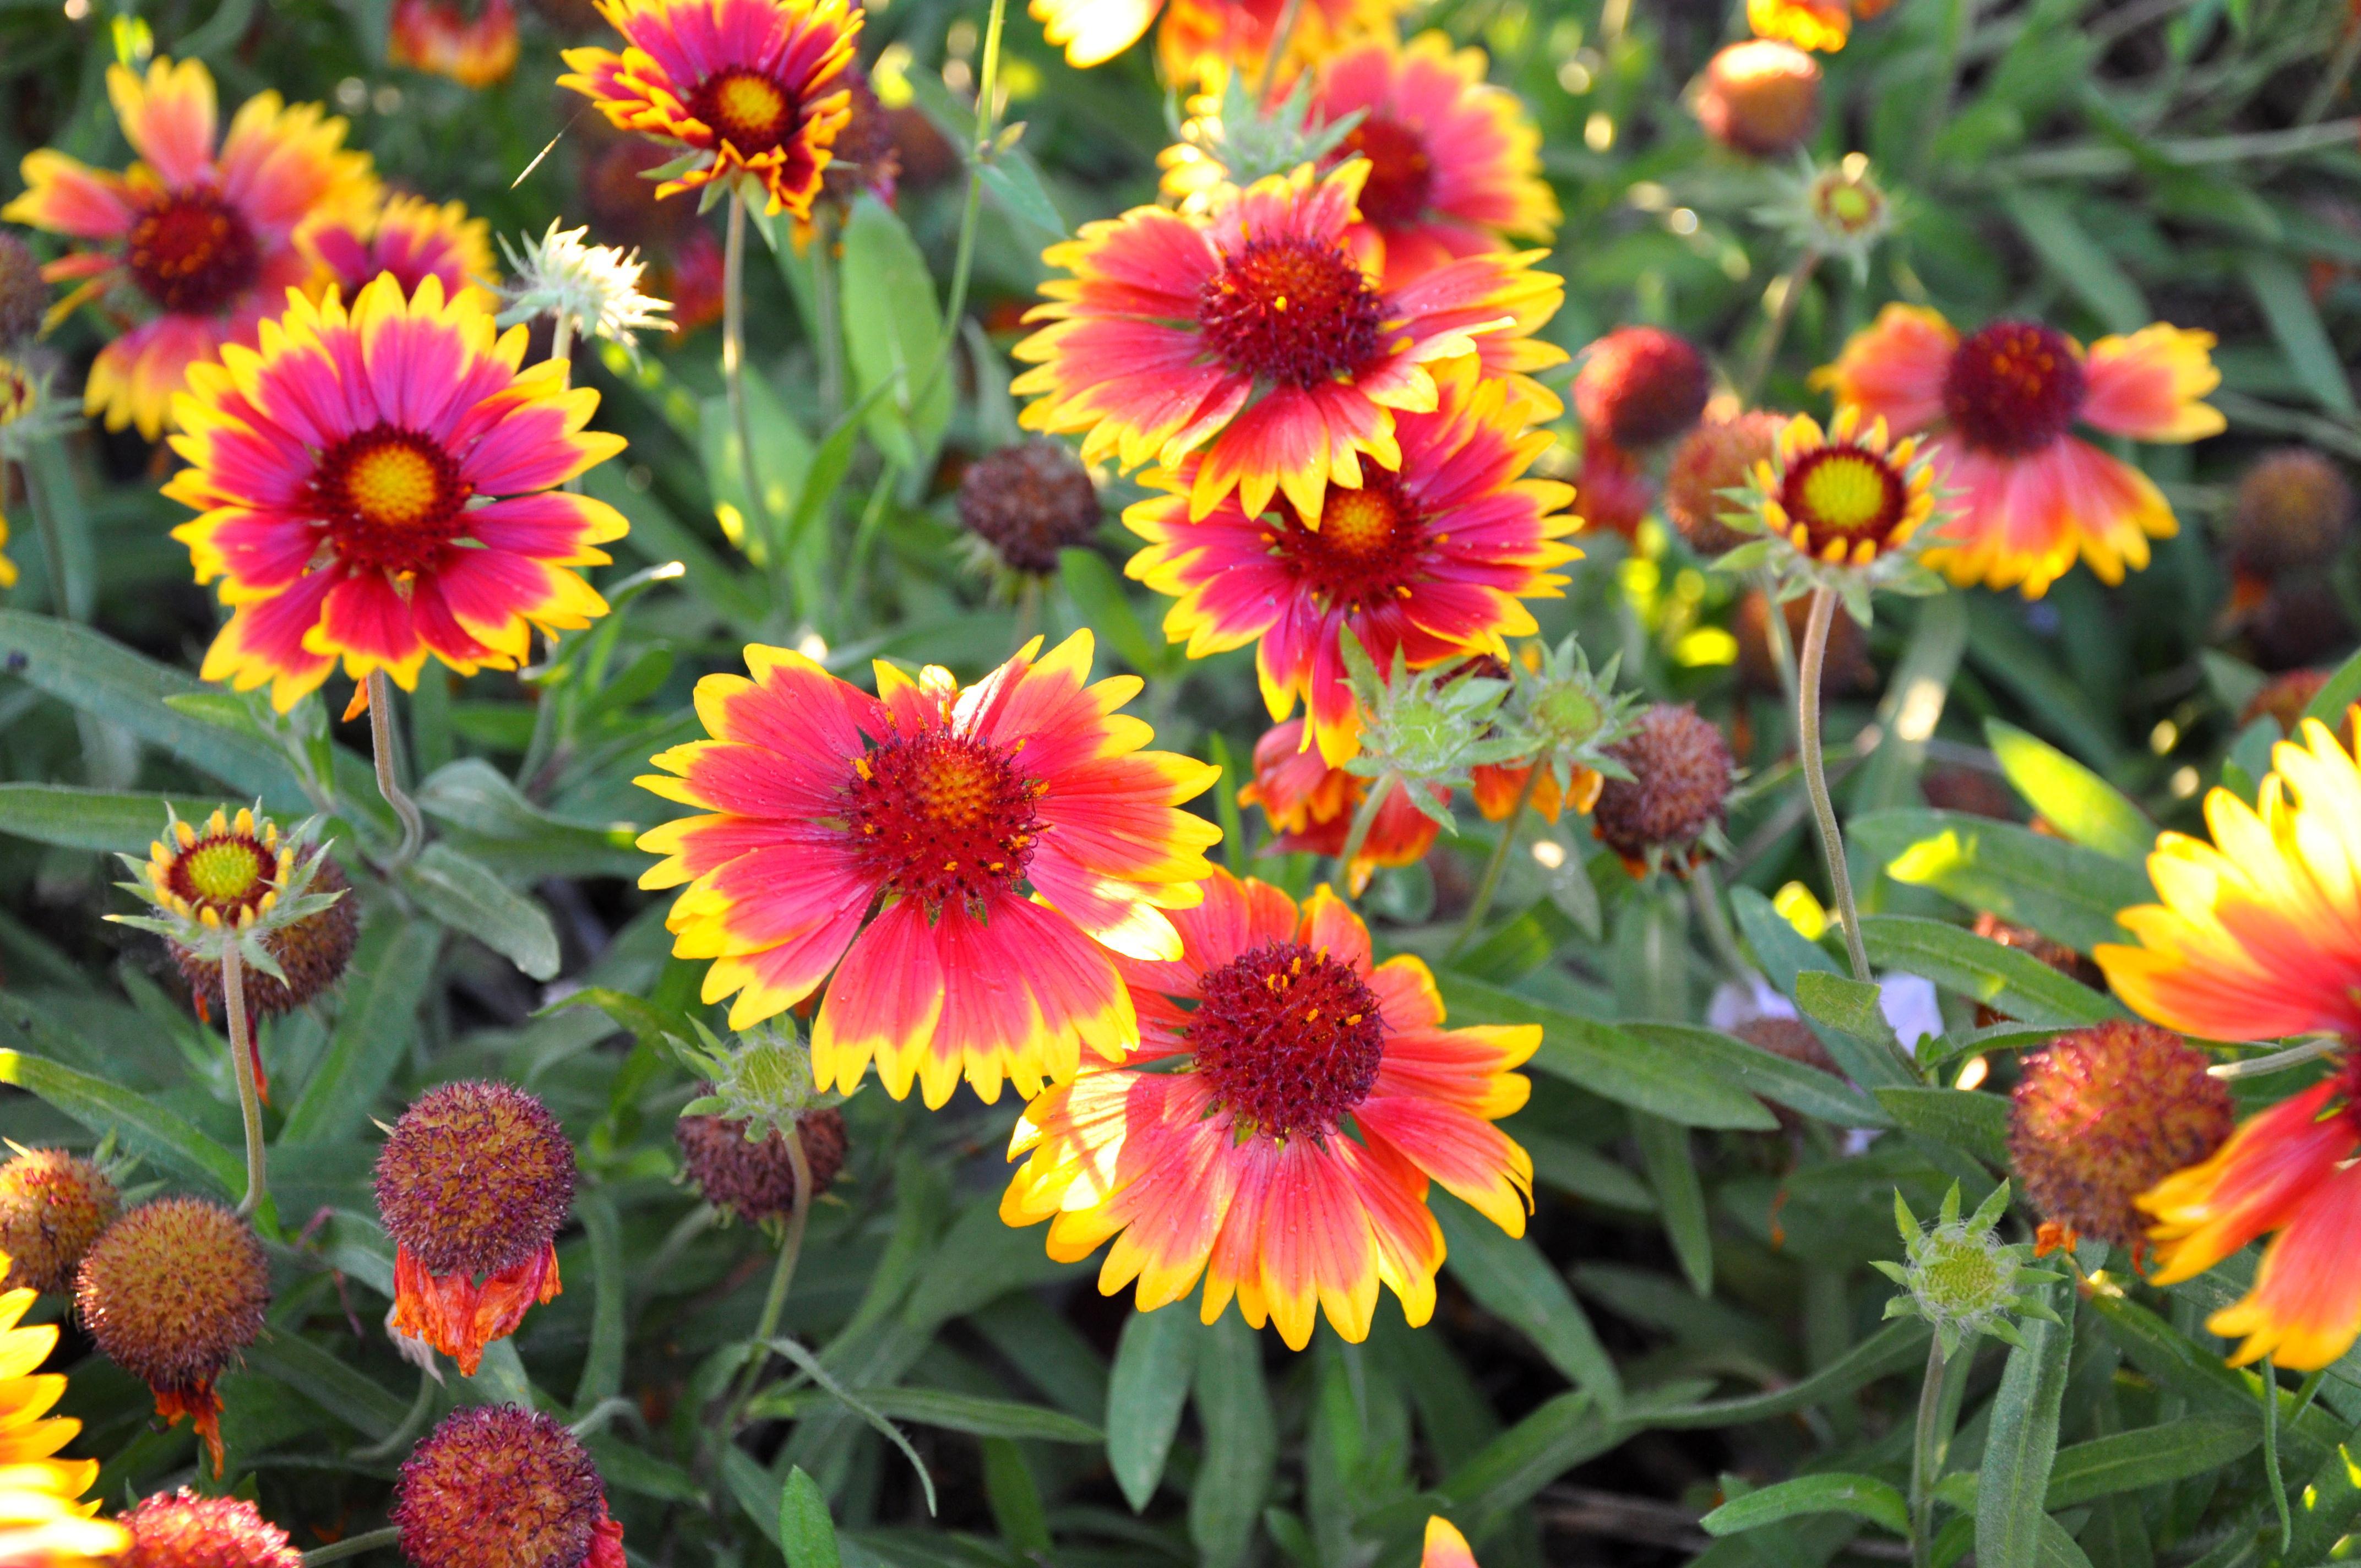 File Gaillardia grandiflora Blanket Flower გაილარდია JPG Wikimedia mons